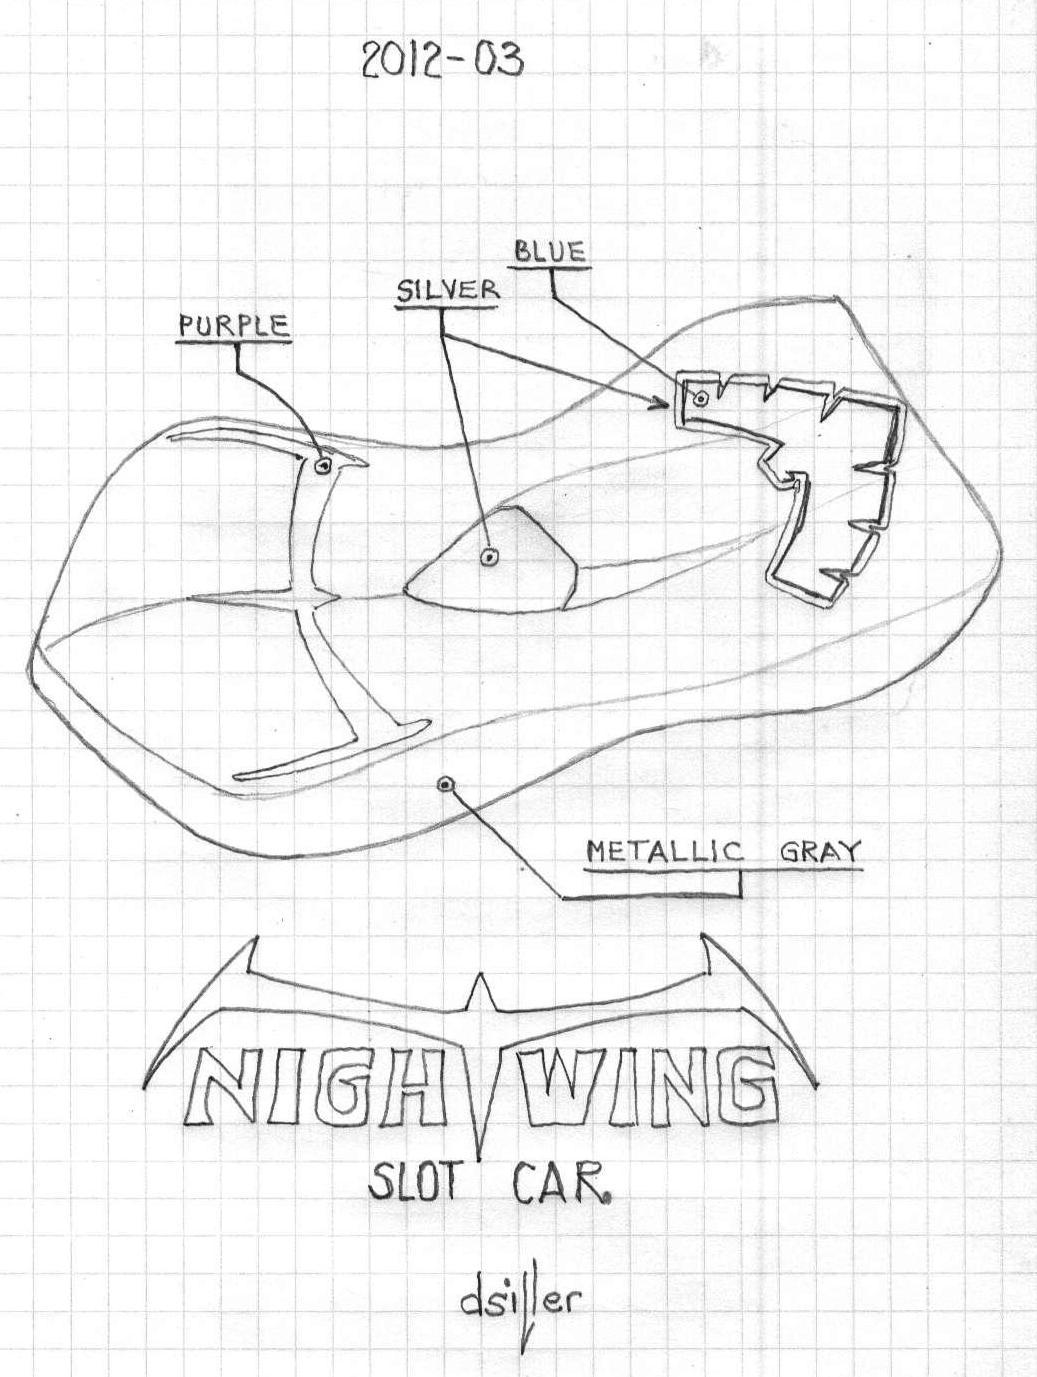 Nightwing01B-vi.jpg